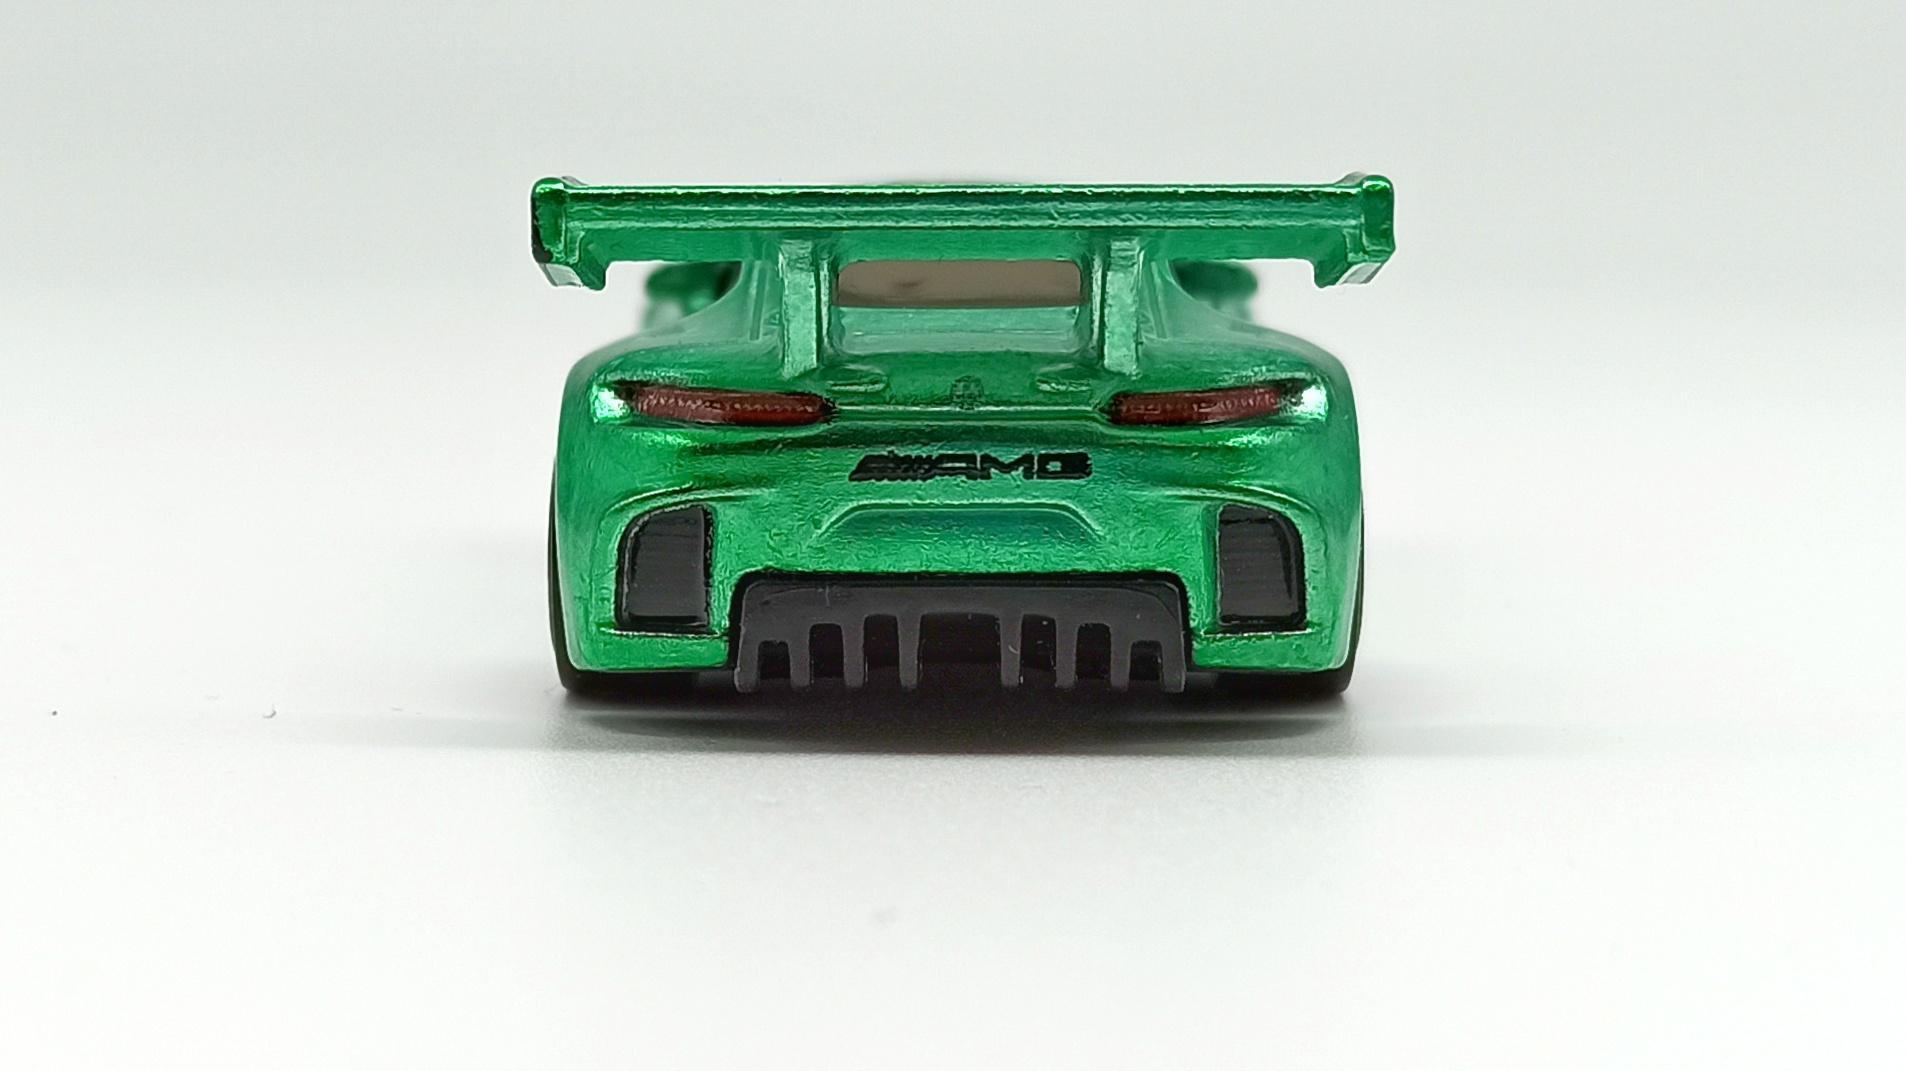 Hot Wheels id '16 Mercedes-AMG GT3 (GML21) 2021 Factory Fresh (03/04) spectraflame green back